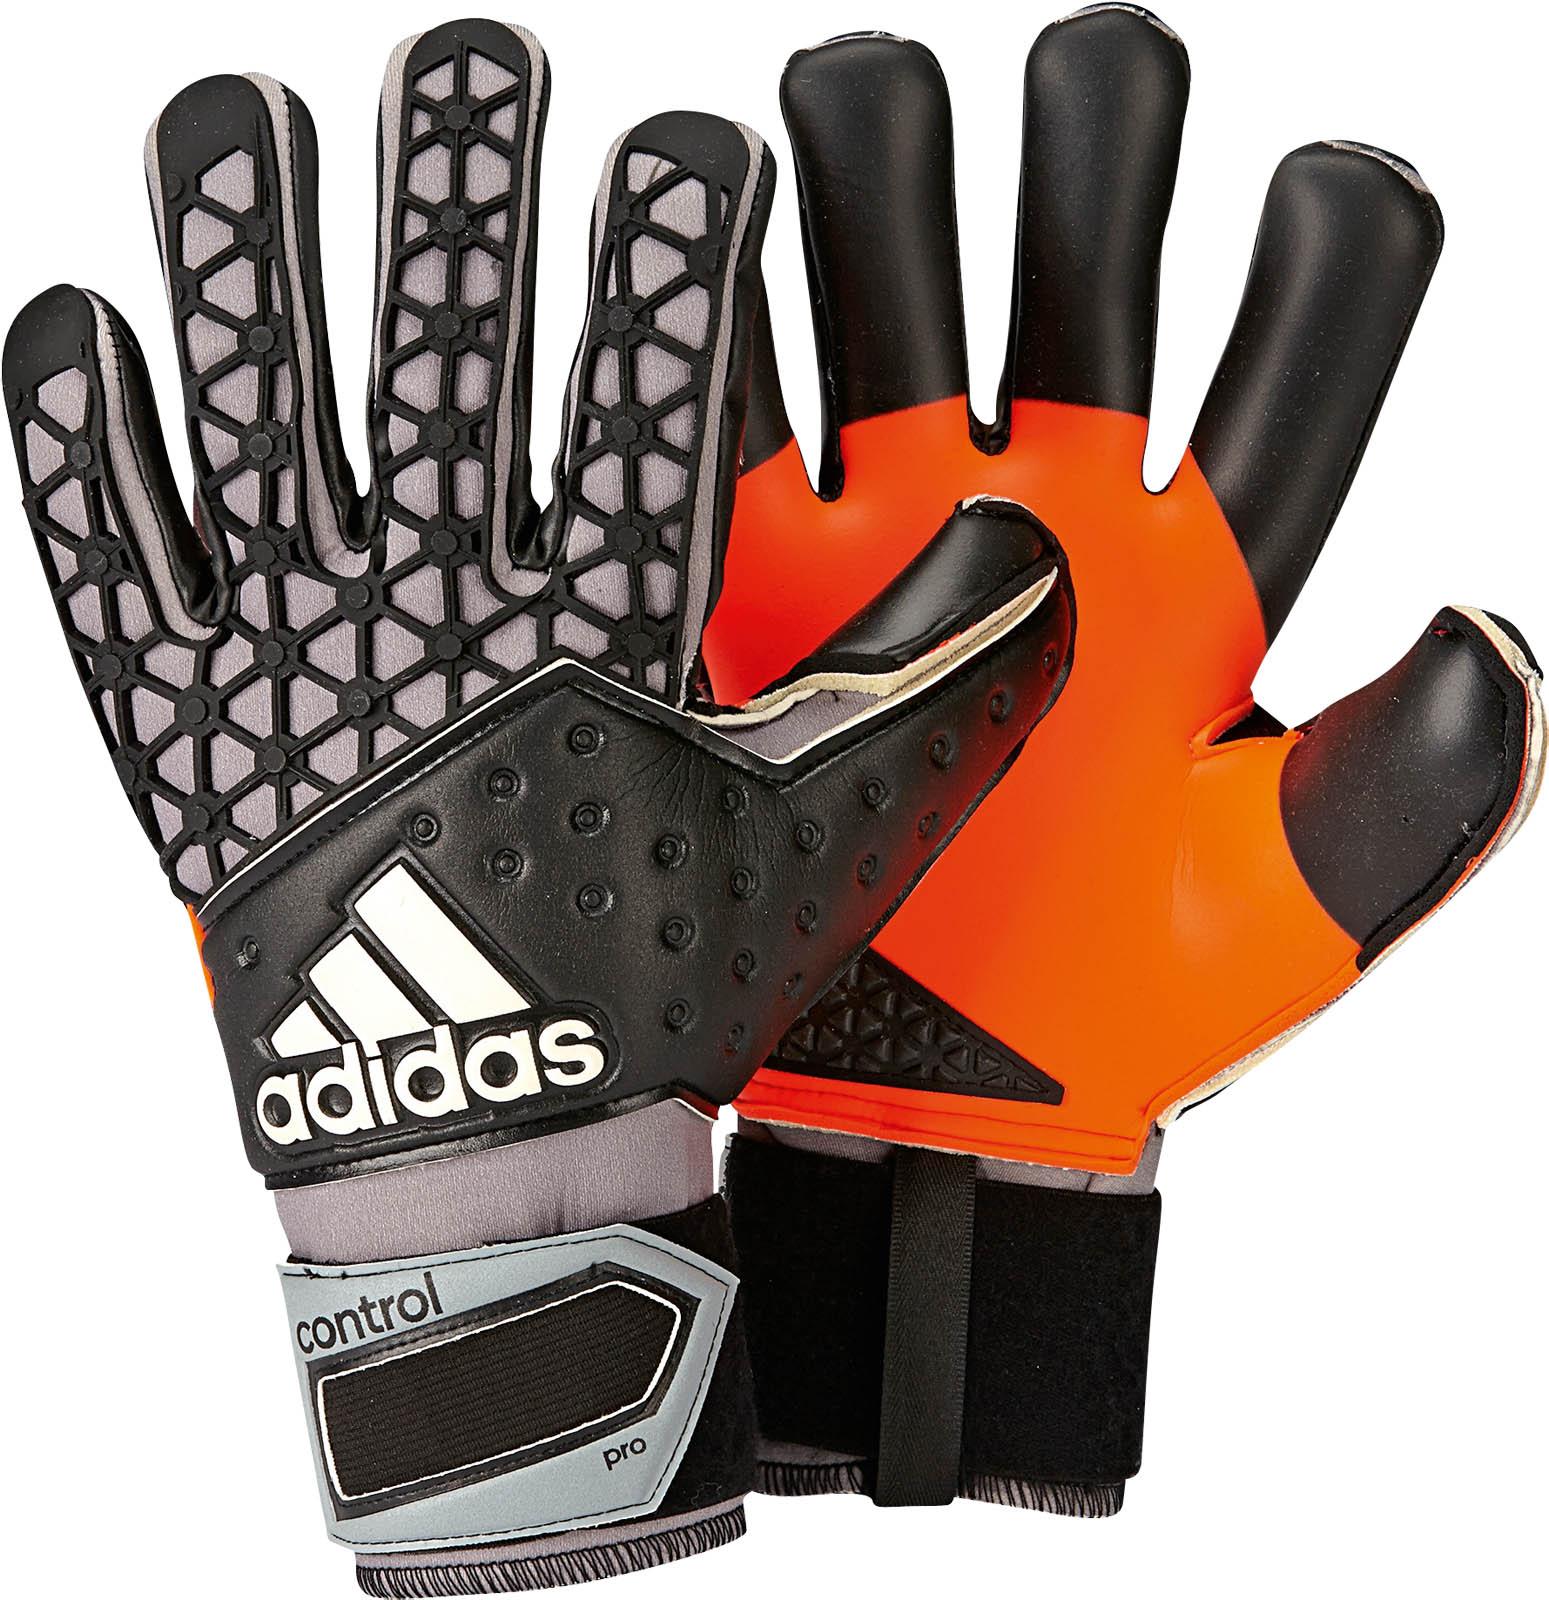 adidas Predator Pro Goalkeeper Gloves - Youth - Black/Red ... |Goalkeeper Gloves Adidas 2015